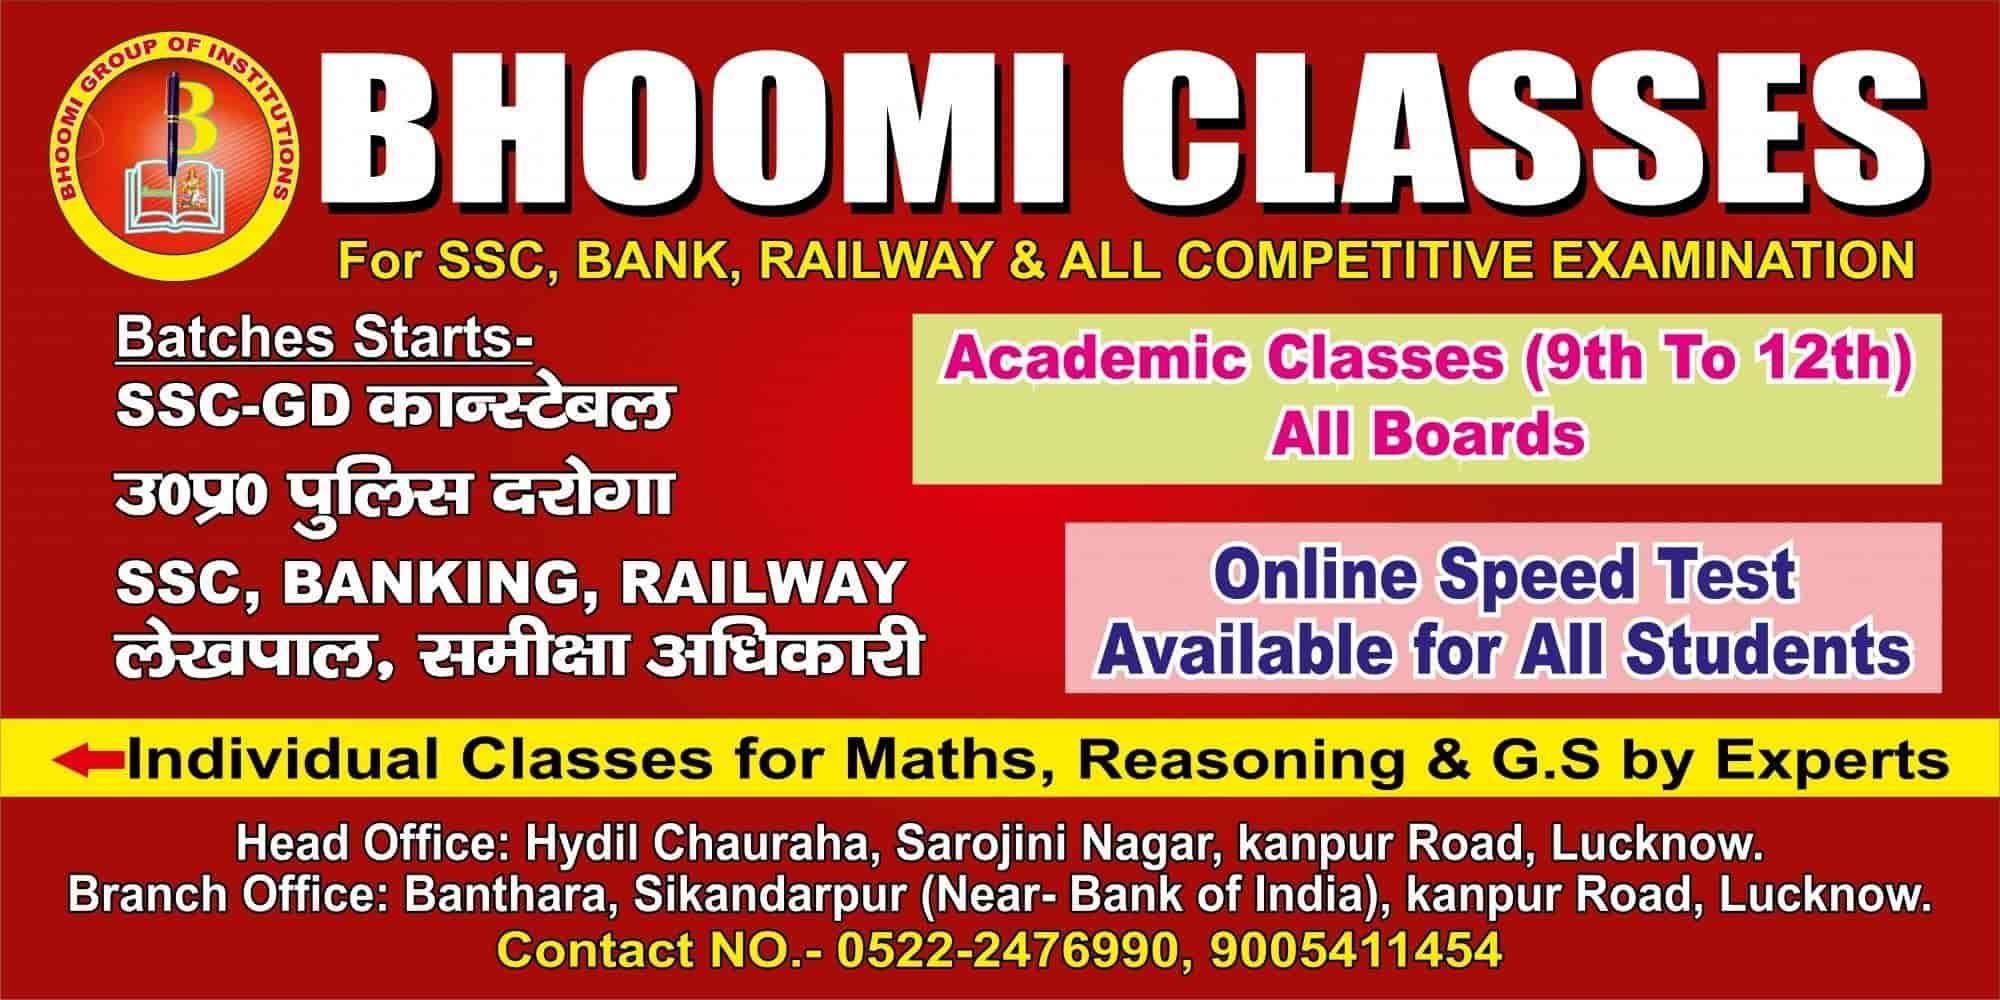 Lucknow Campus (bhoomi Classes), Sarojini Nagar - Bhumi Classes ...